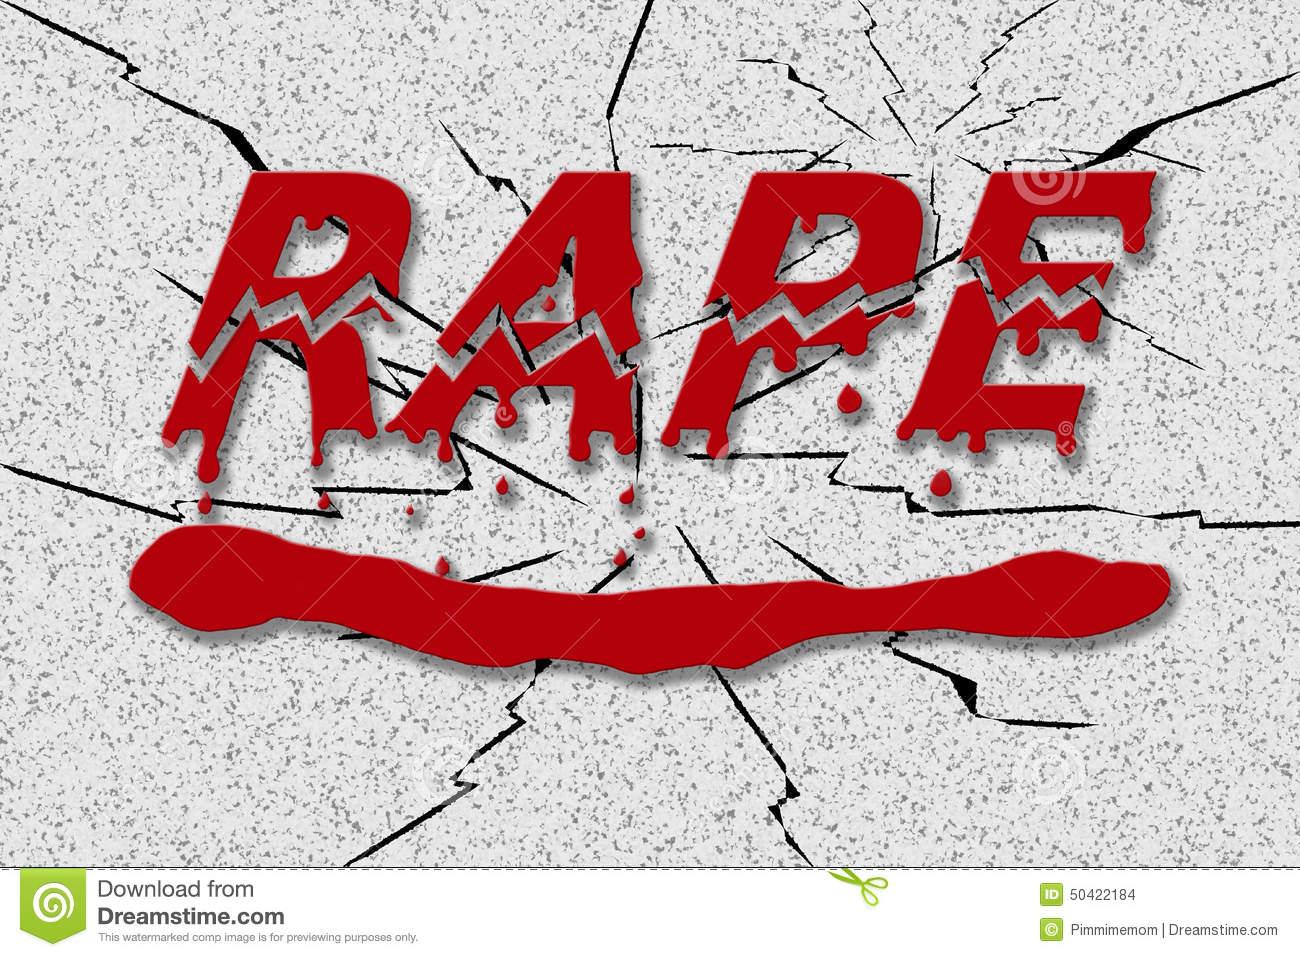 Rape clips